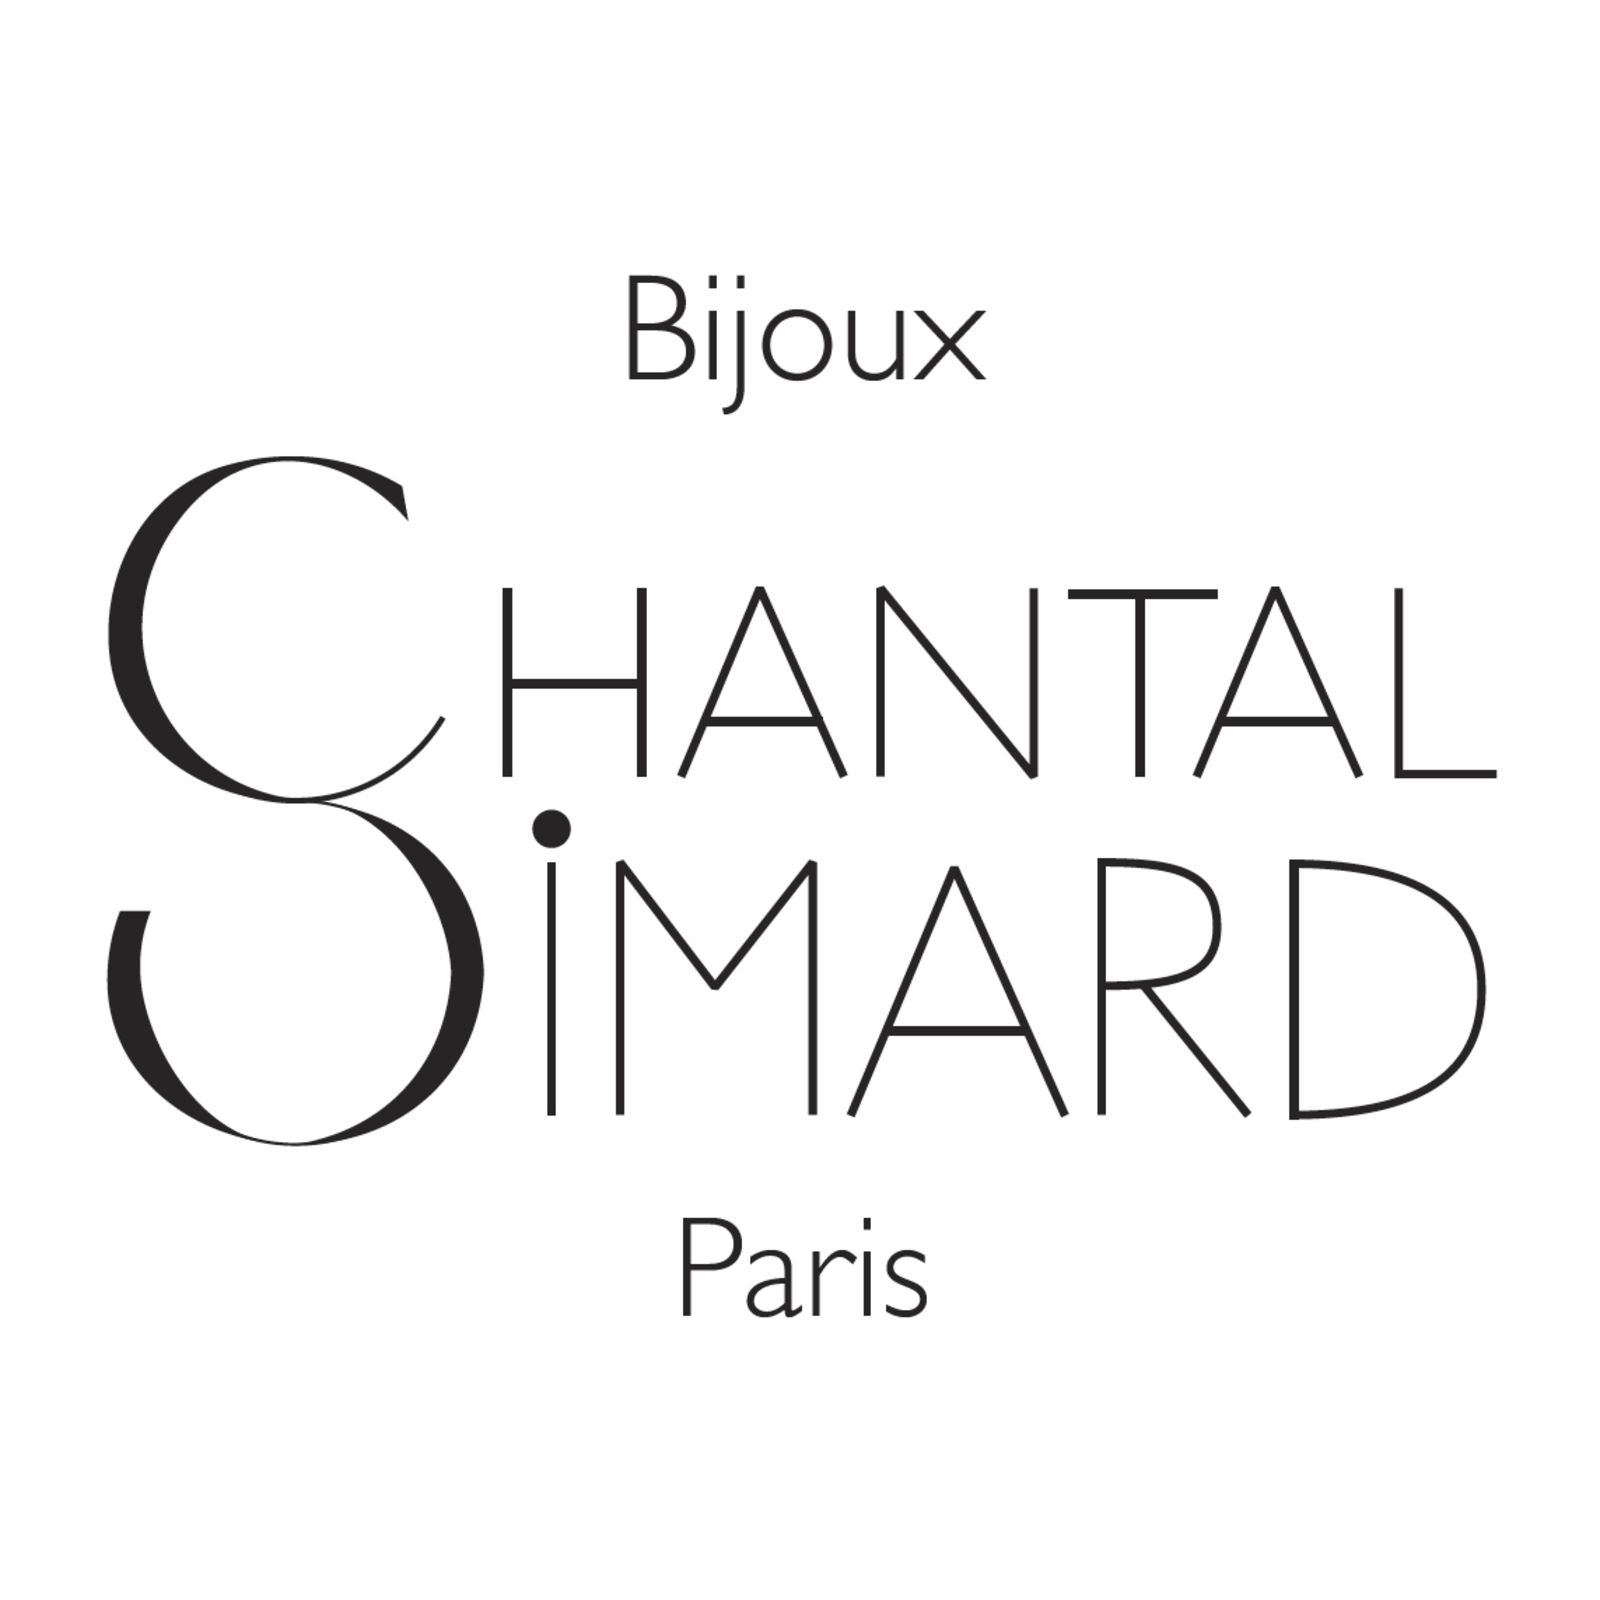 CHANTAL SIMARD